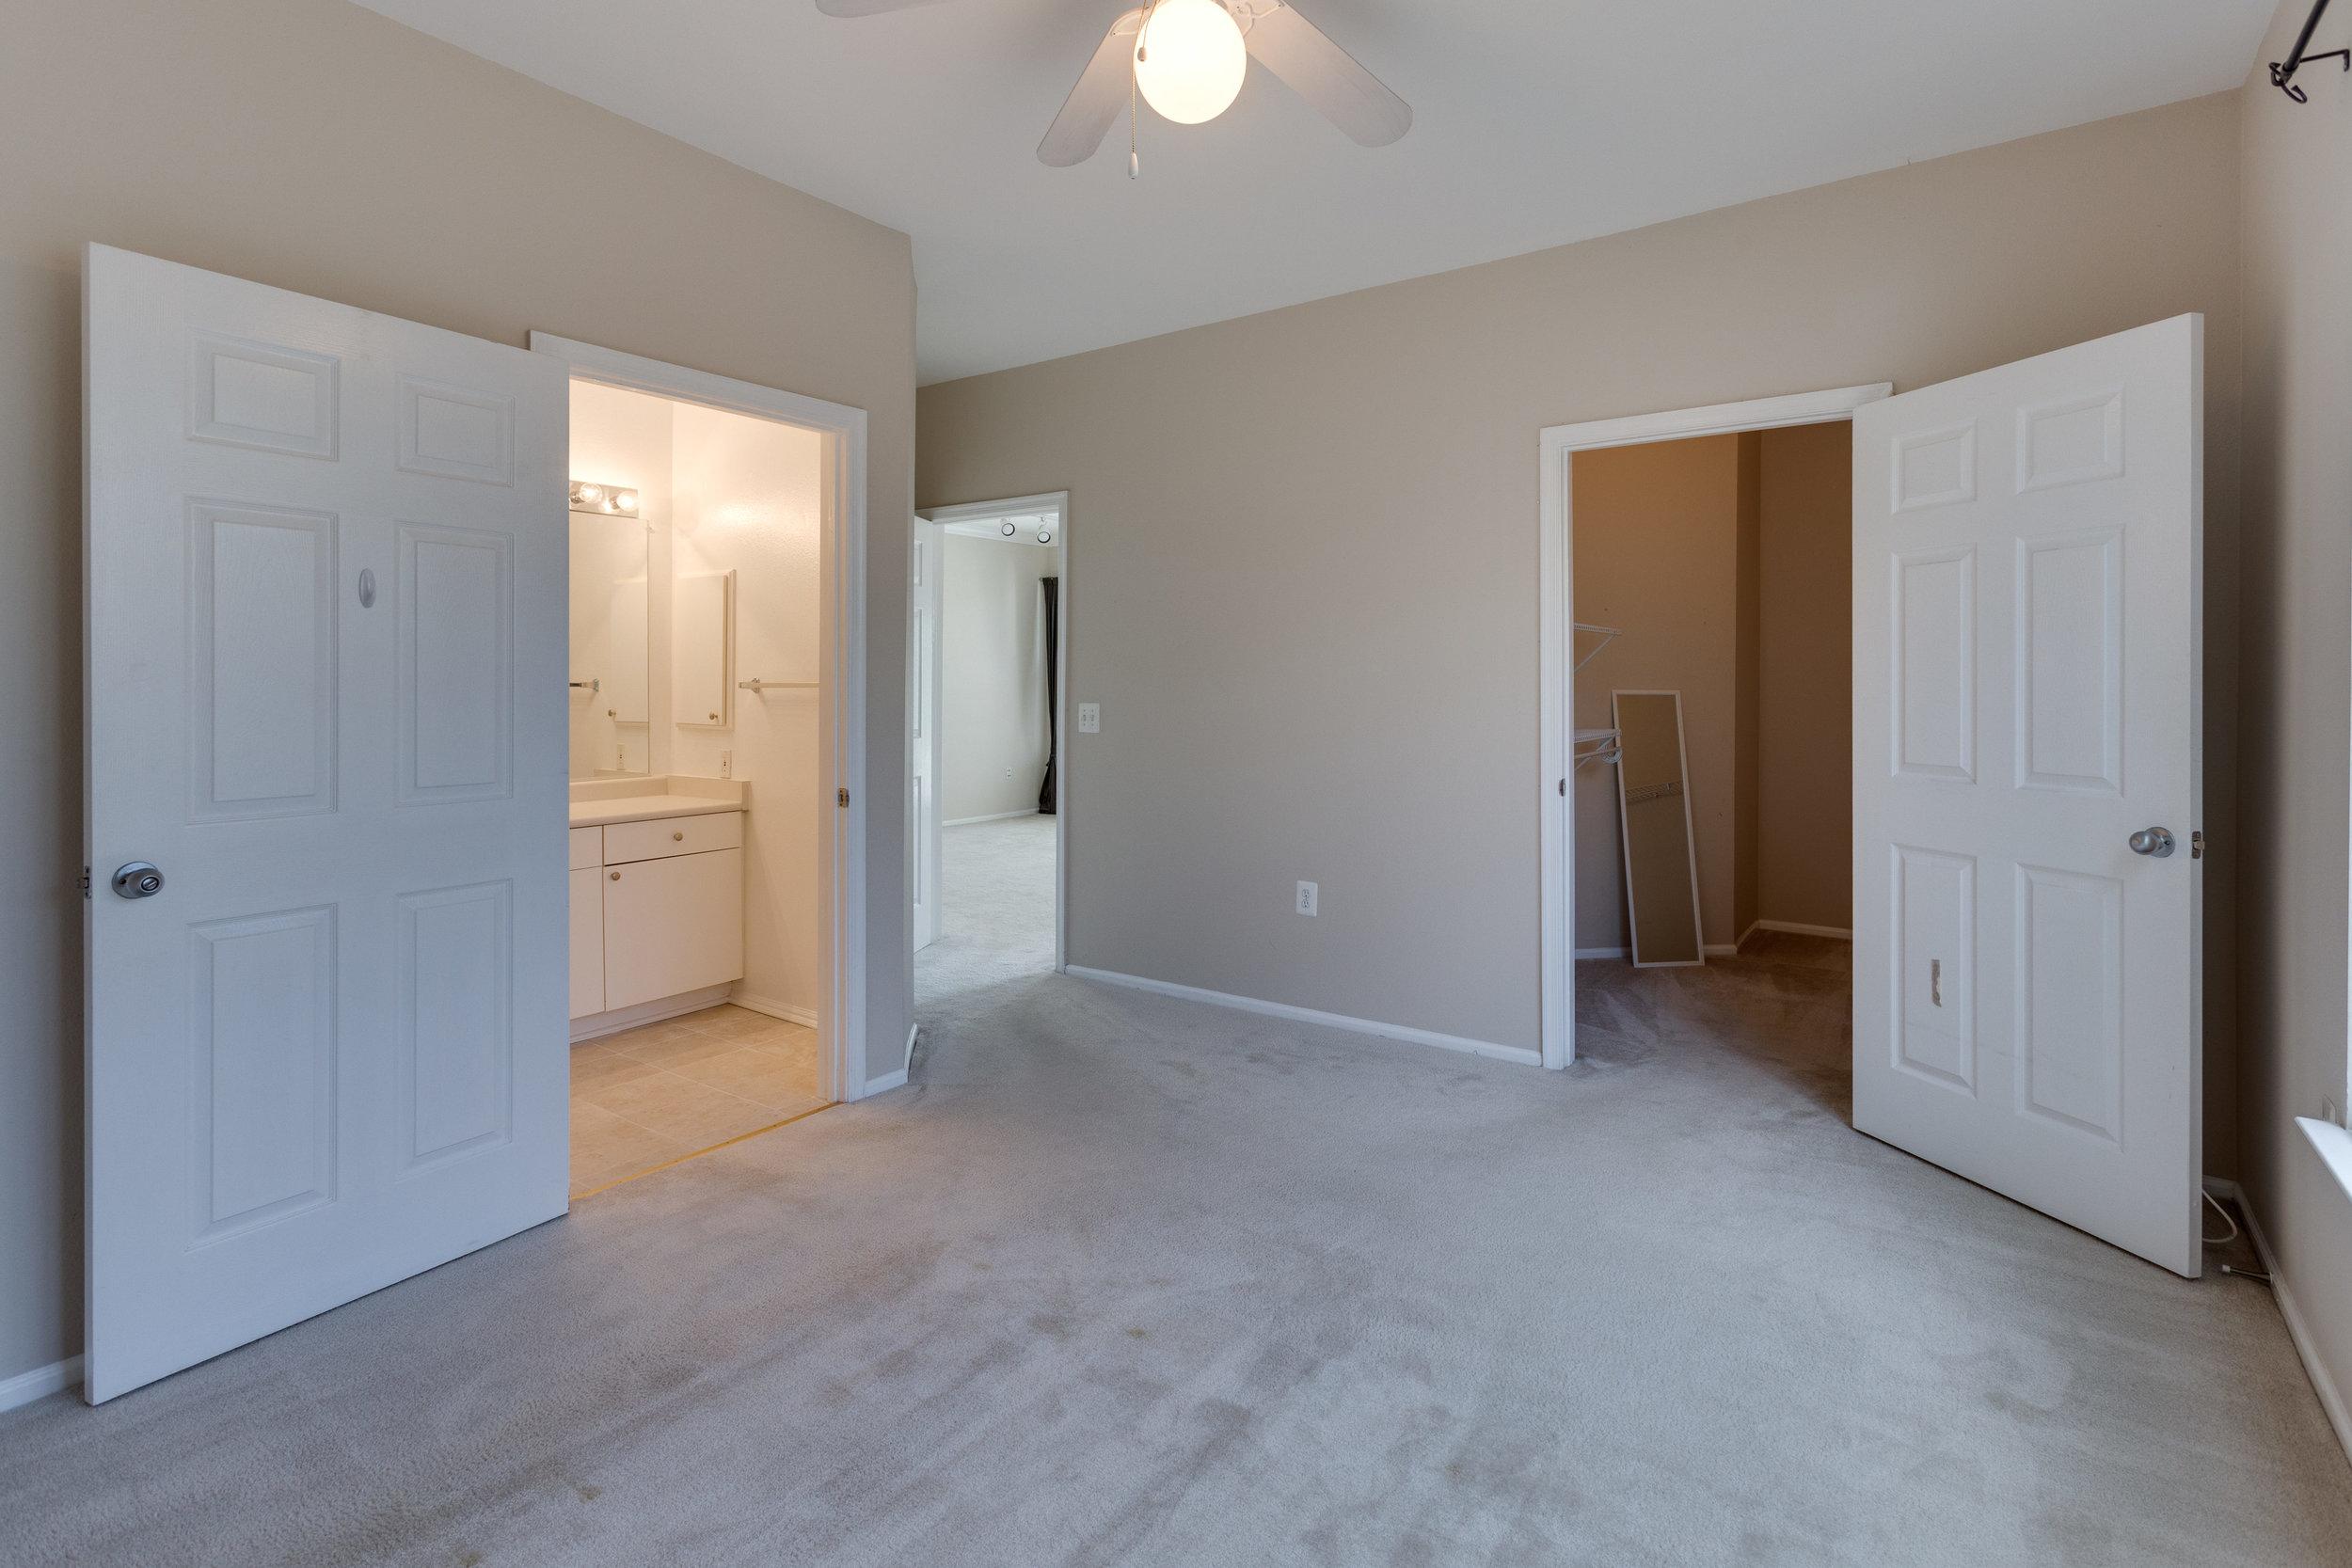 3009 Nicosh Cir Unit 4301-print-013-25-Master Bedroom-4200x2800-300dpi.jpg